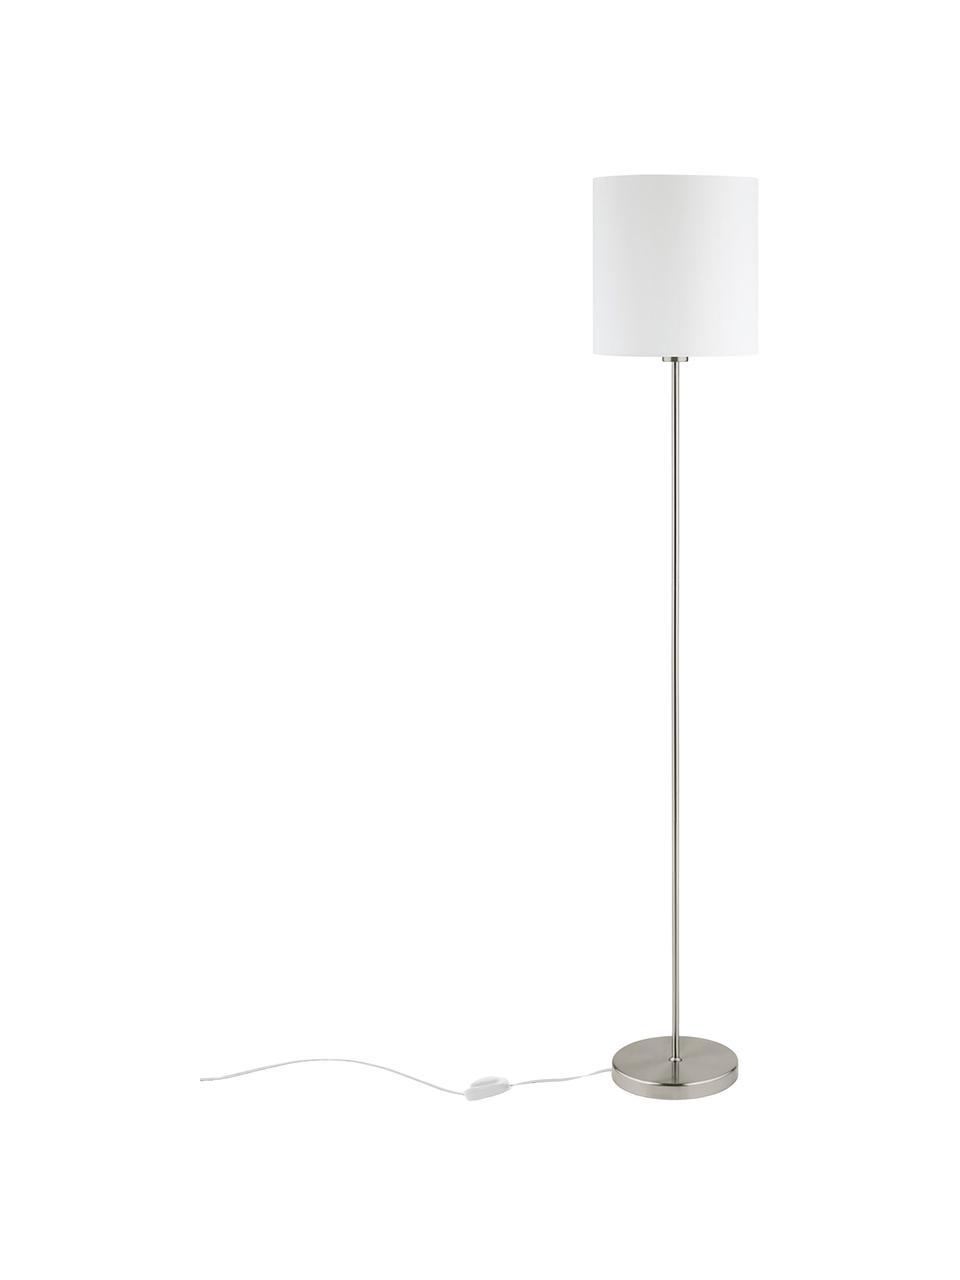 Lampada da terra con paralume in tessuto Harry, Paralume: tessuto, Base della lampada: metallo nichelato, Bianco, argentato, Ø 28 x Alt. 158 cm